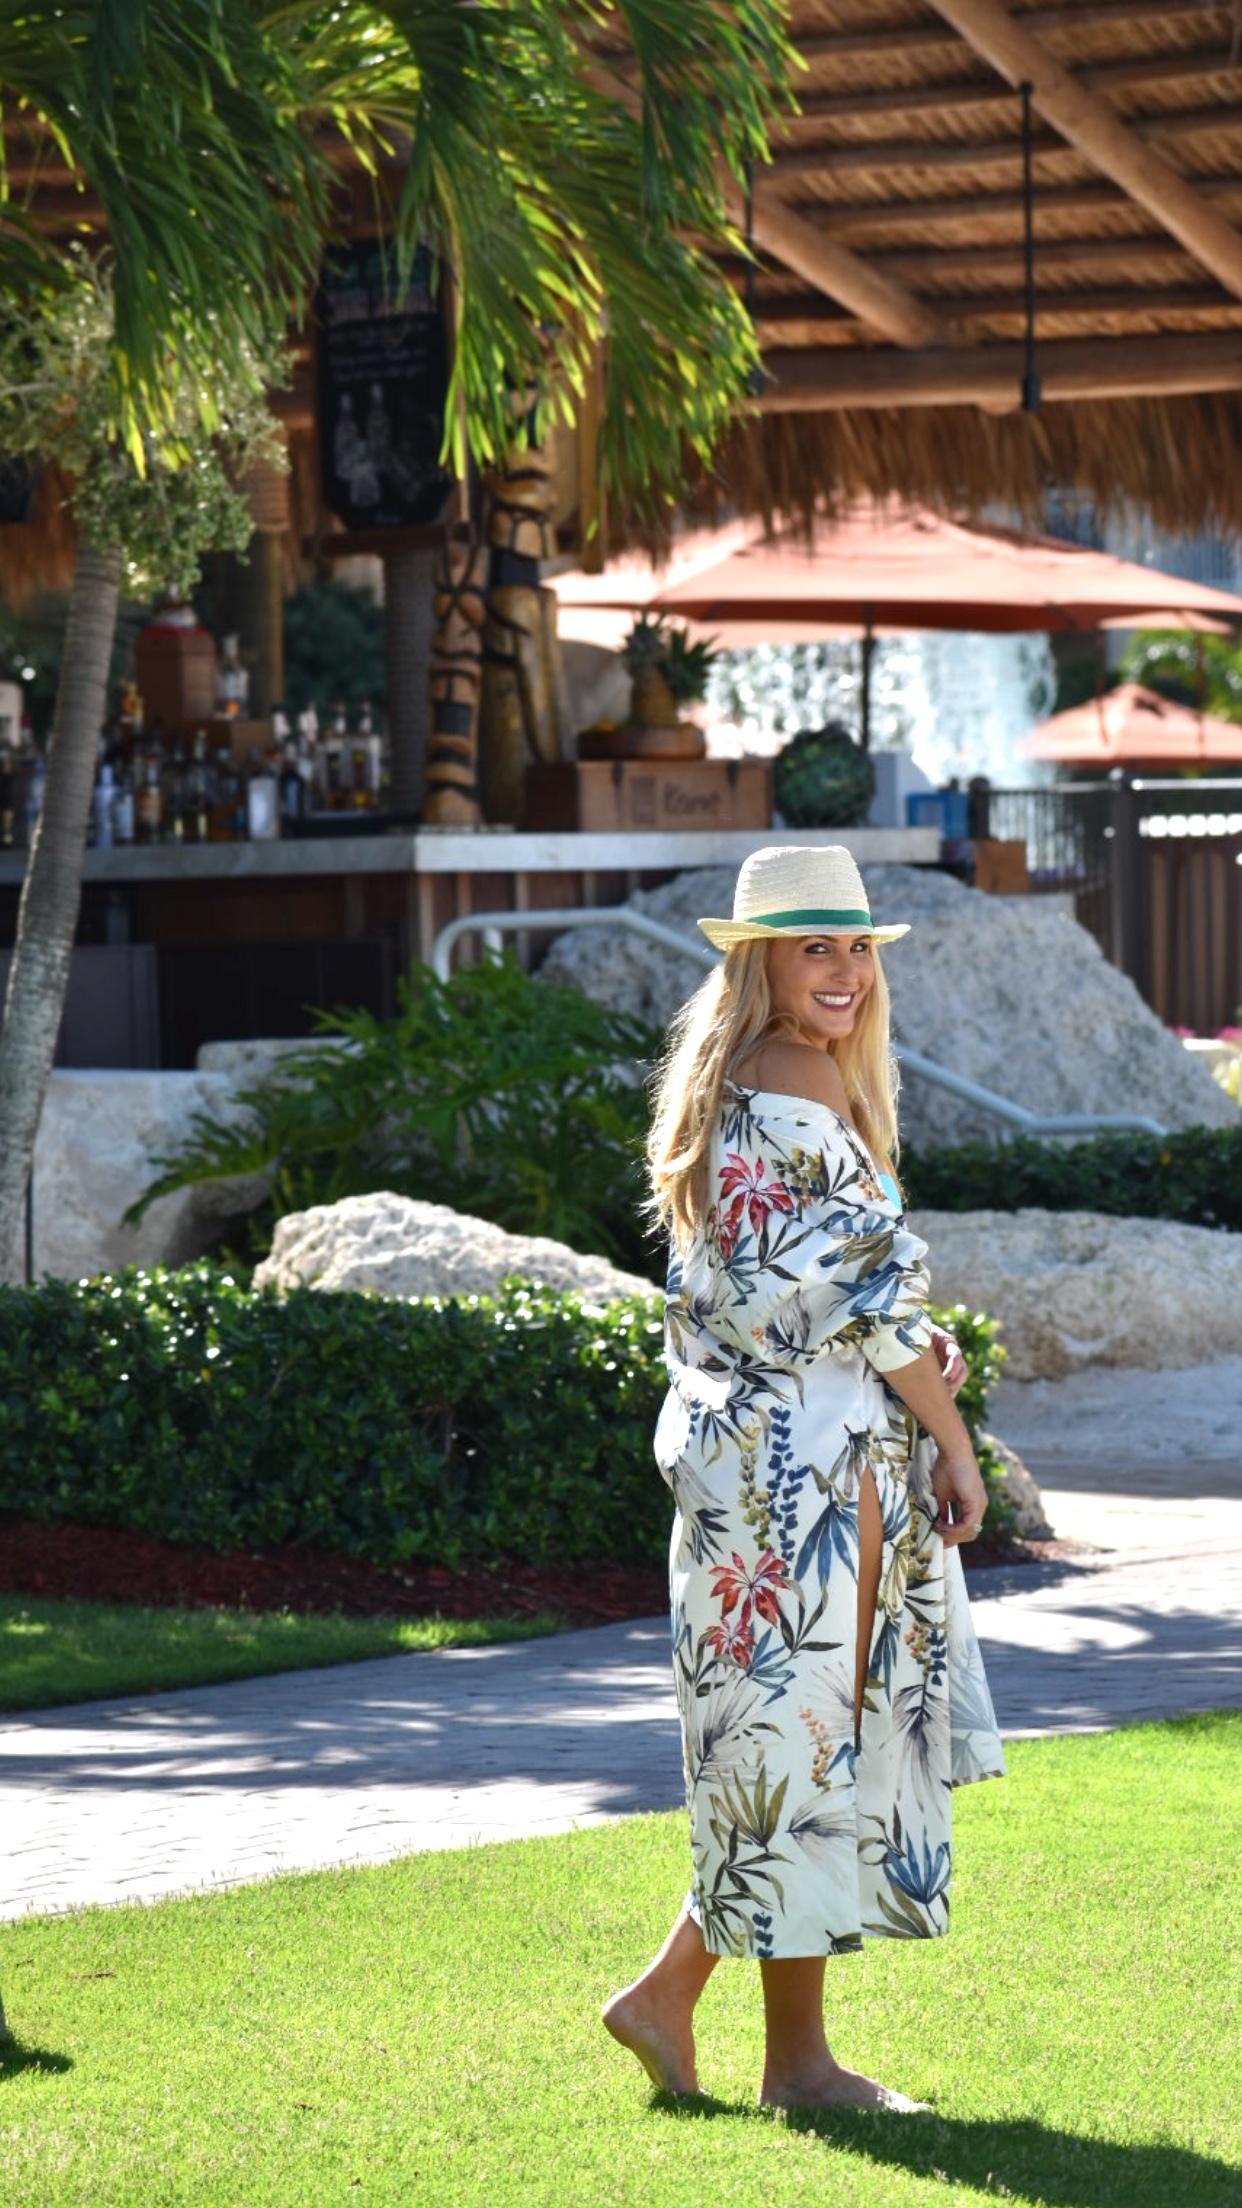 Kimono, Floral Print Kimono, Fedora and Bikini in Marco Island Florida